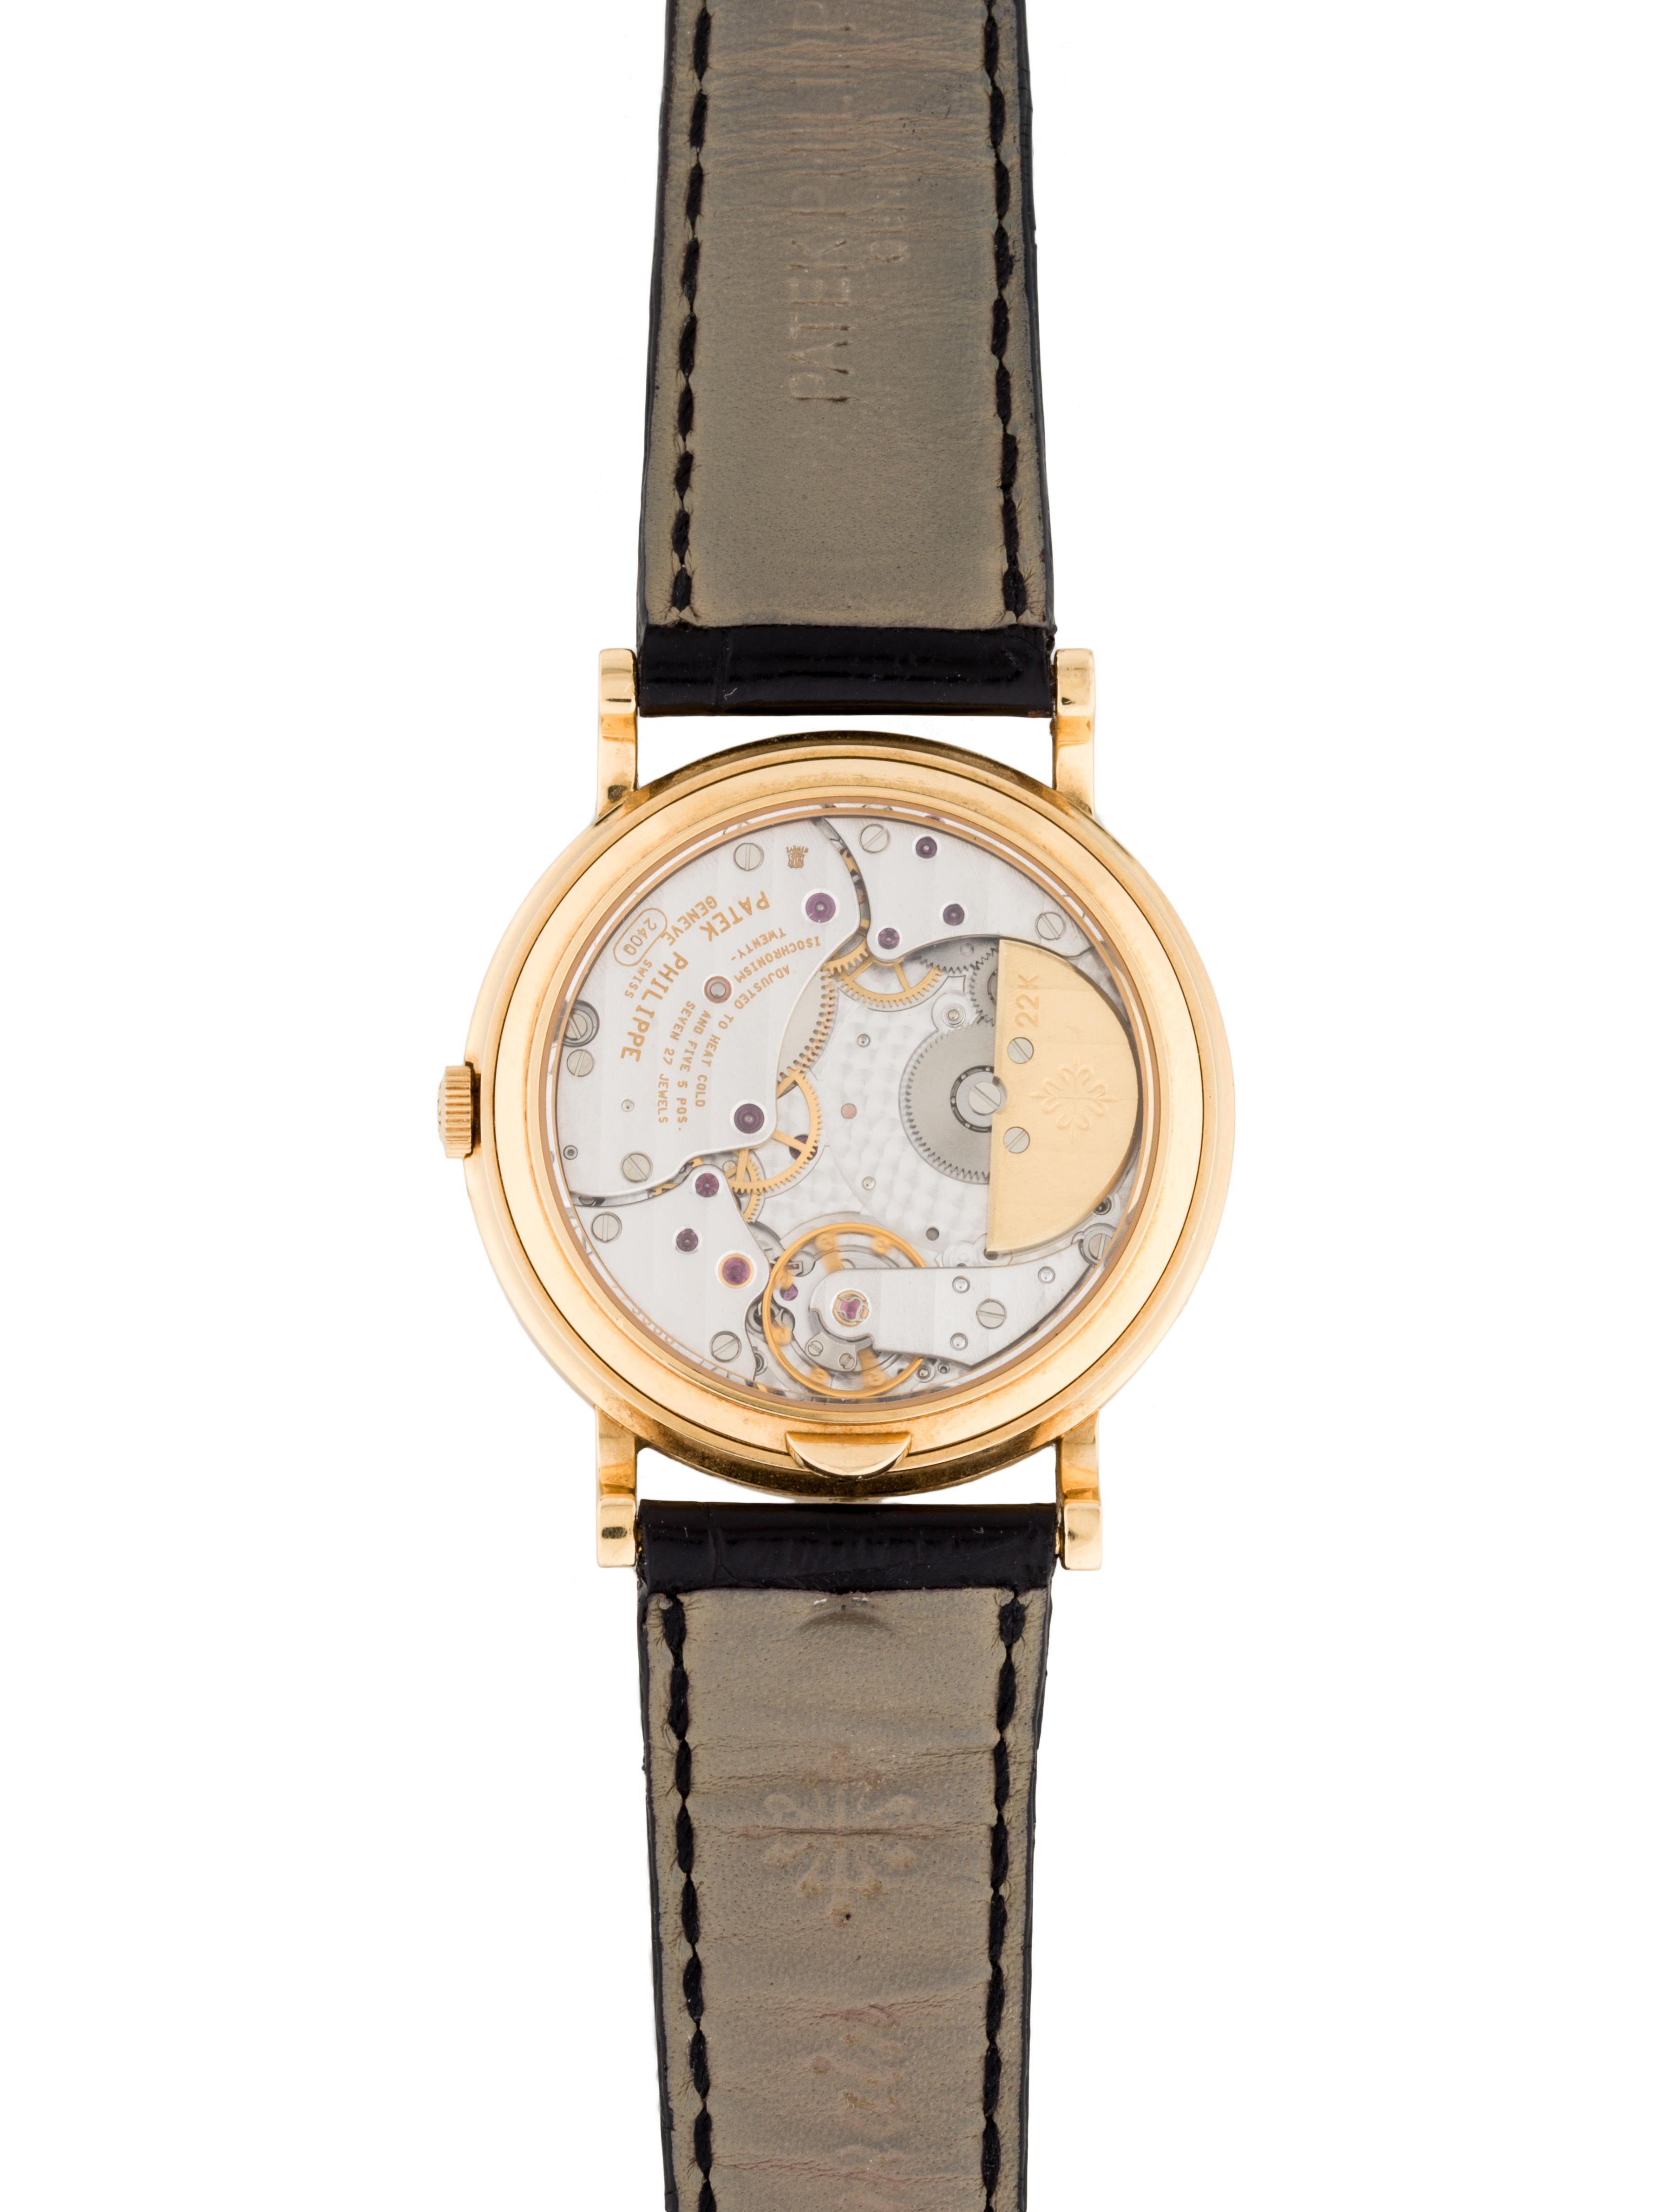 Perpetual Calendar Watch : Patek philippe j perpetual calendar watch strap